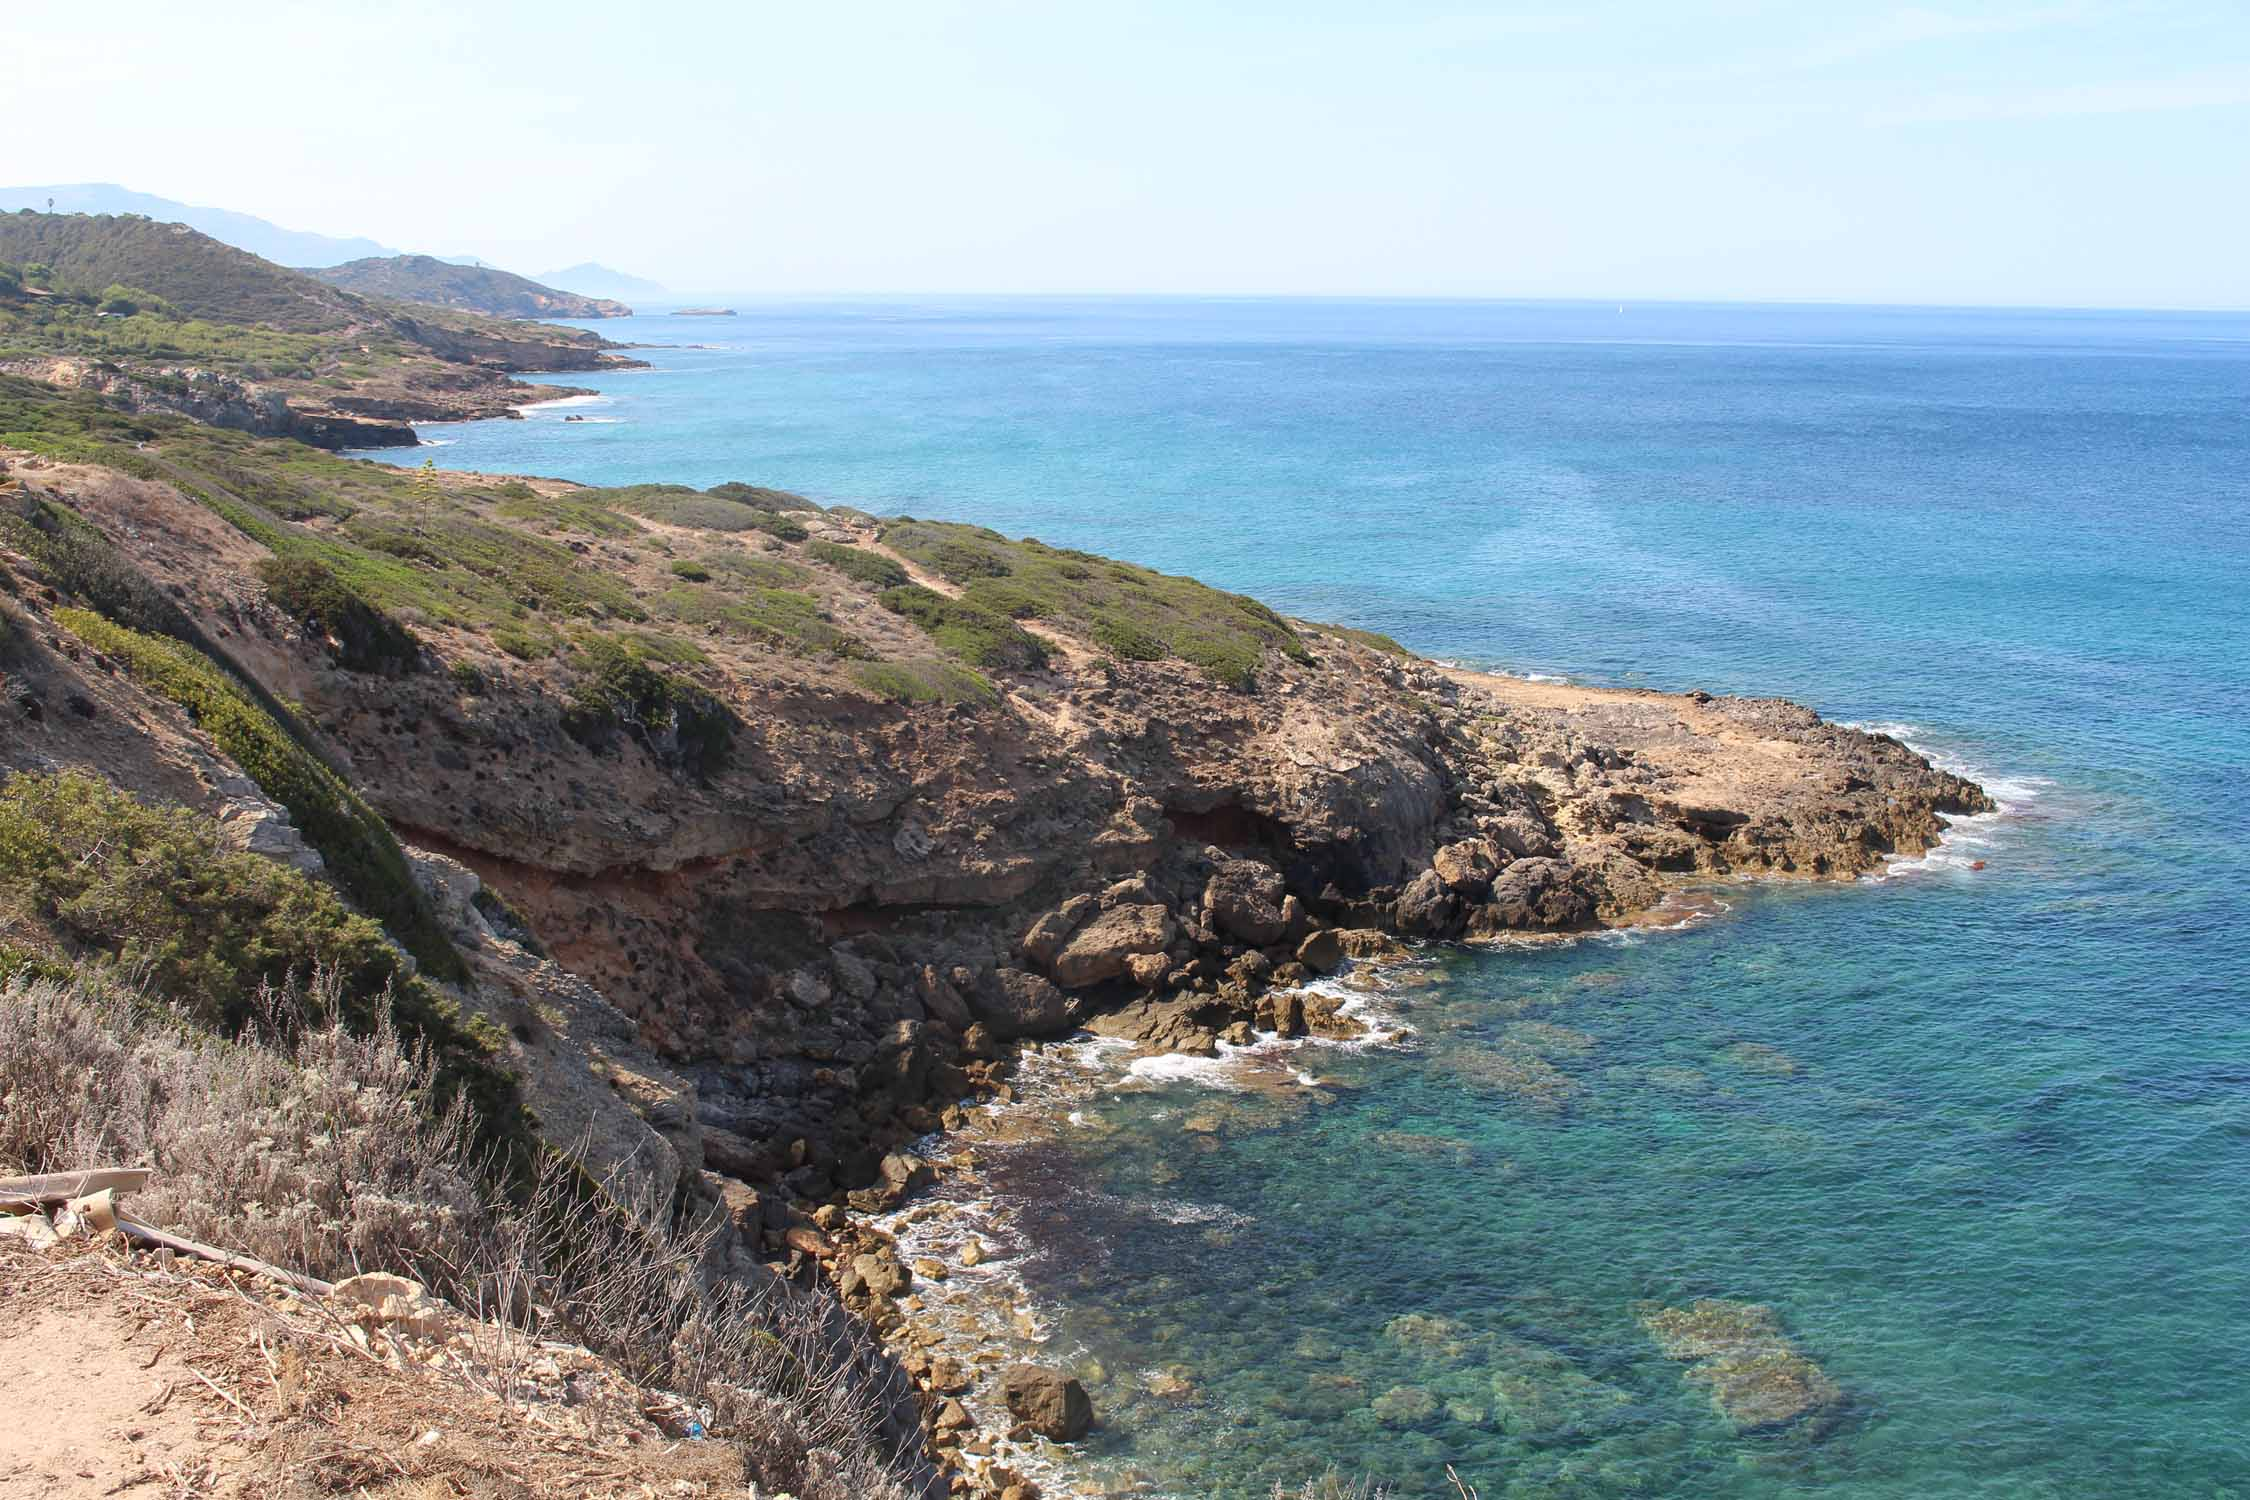 Road Alghero - Bosa